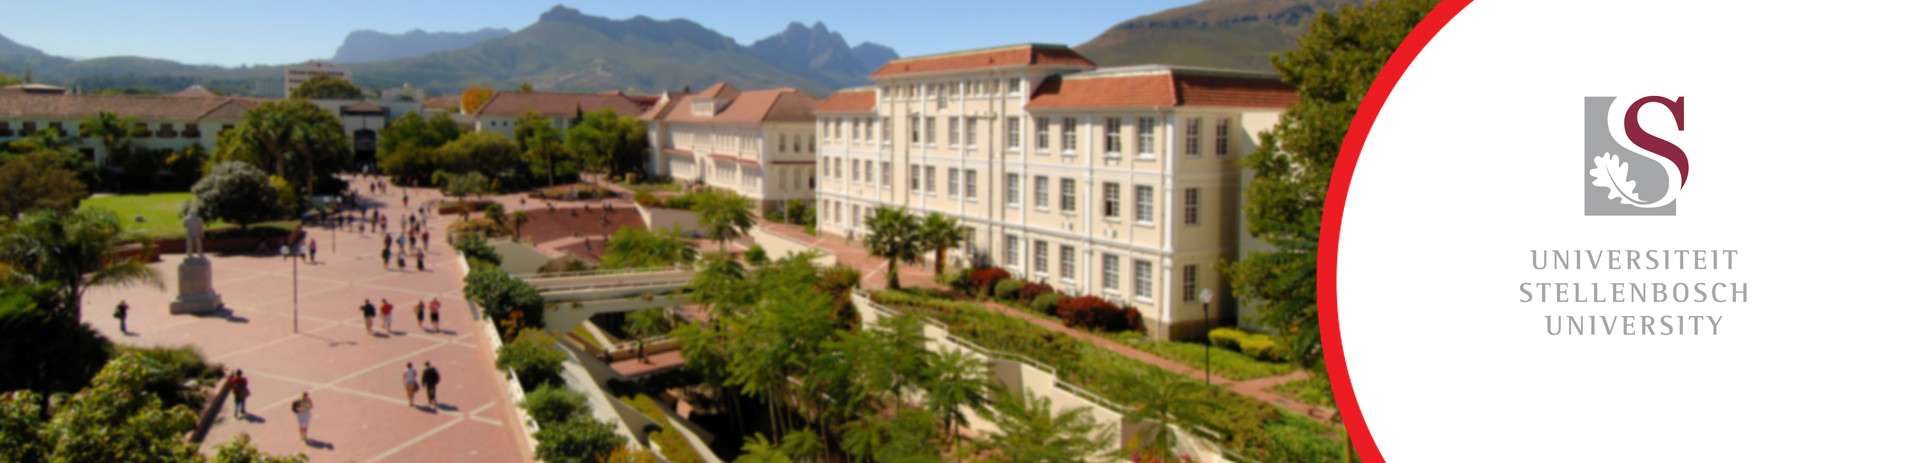 Stellenbosche-University---South-Africa